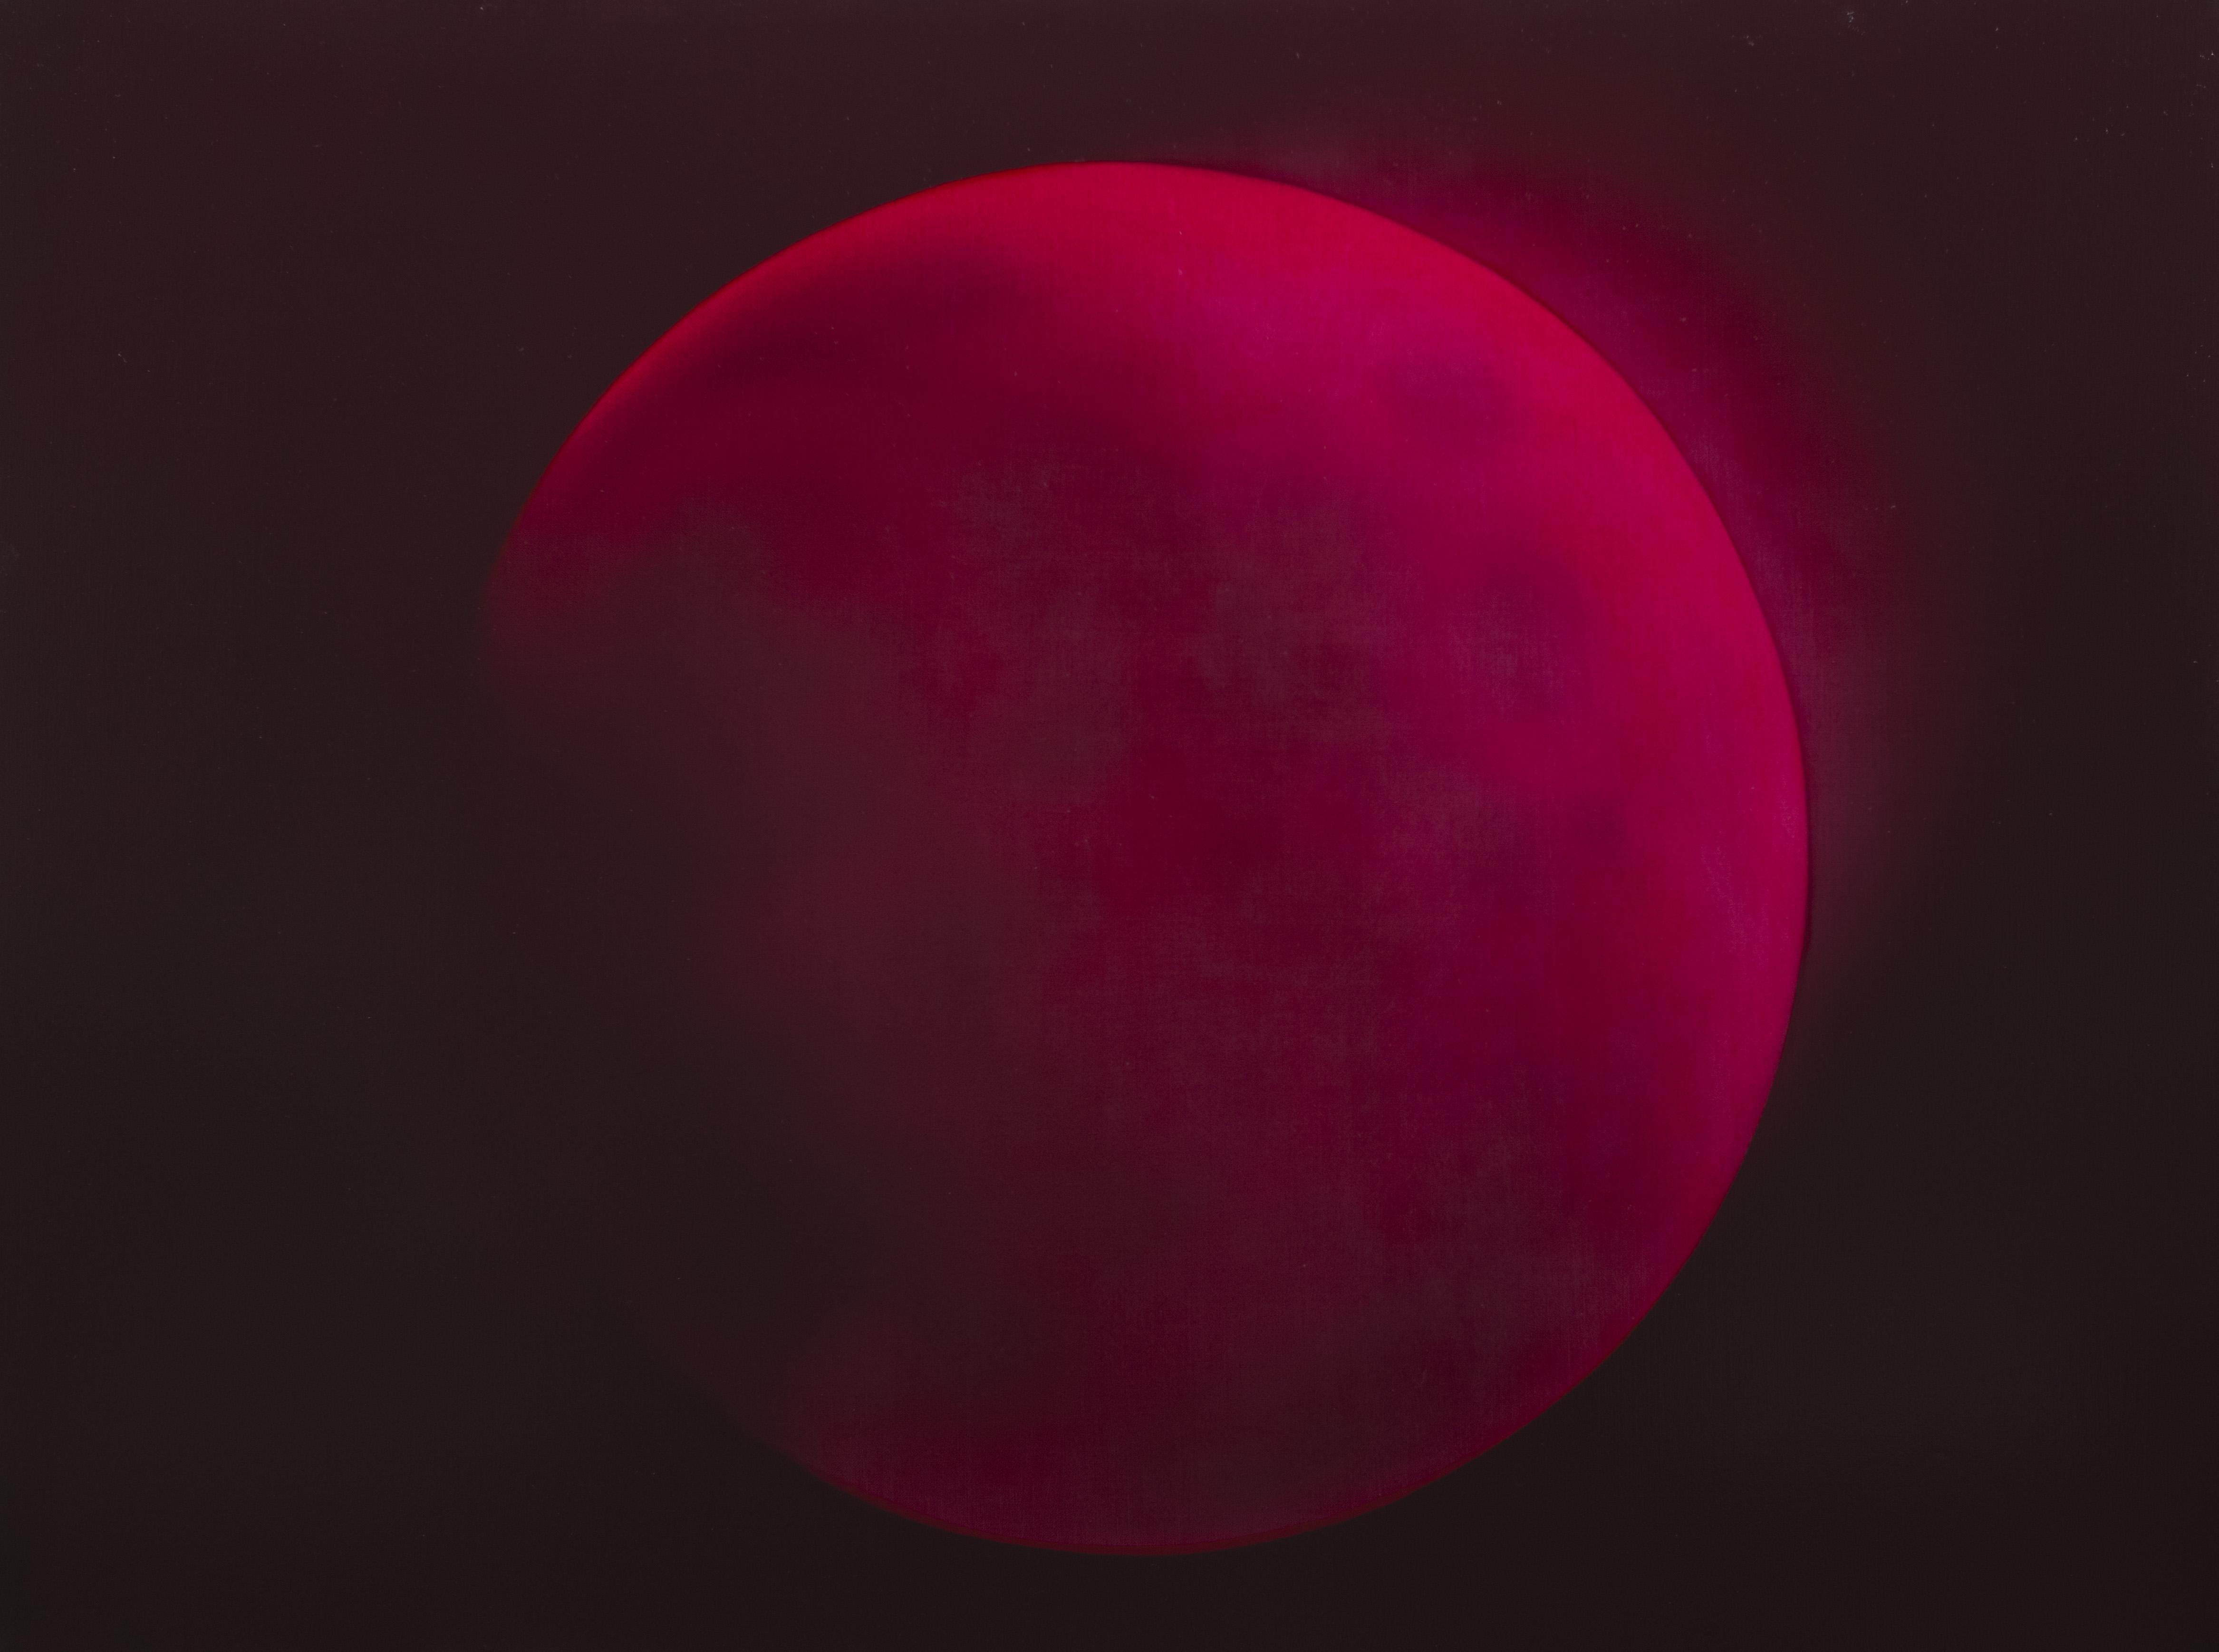 Luna Rossa, 2019 <br /> Oil on linen,91x121cm